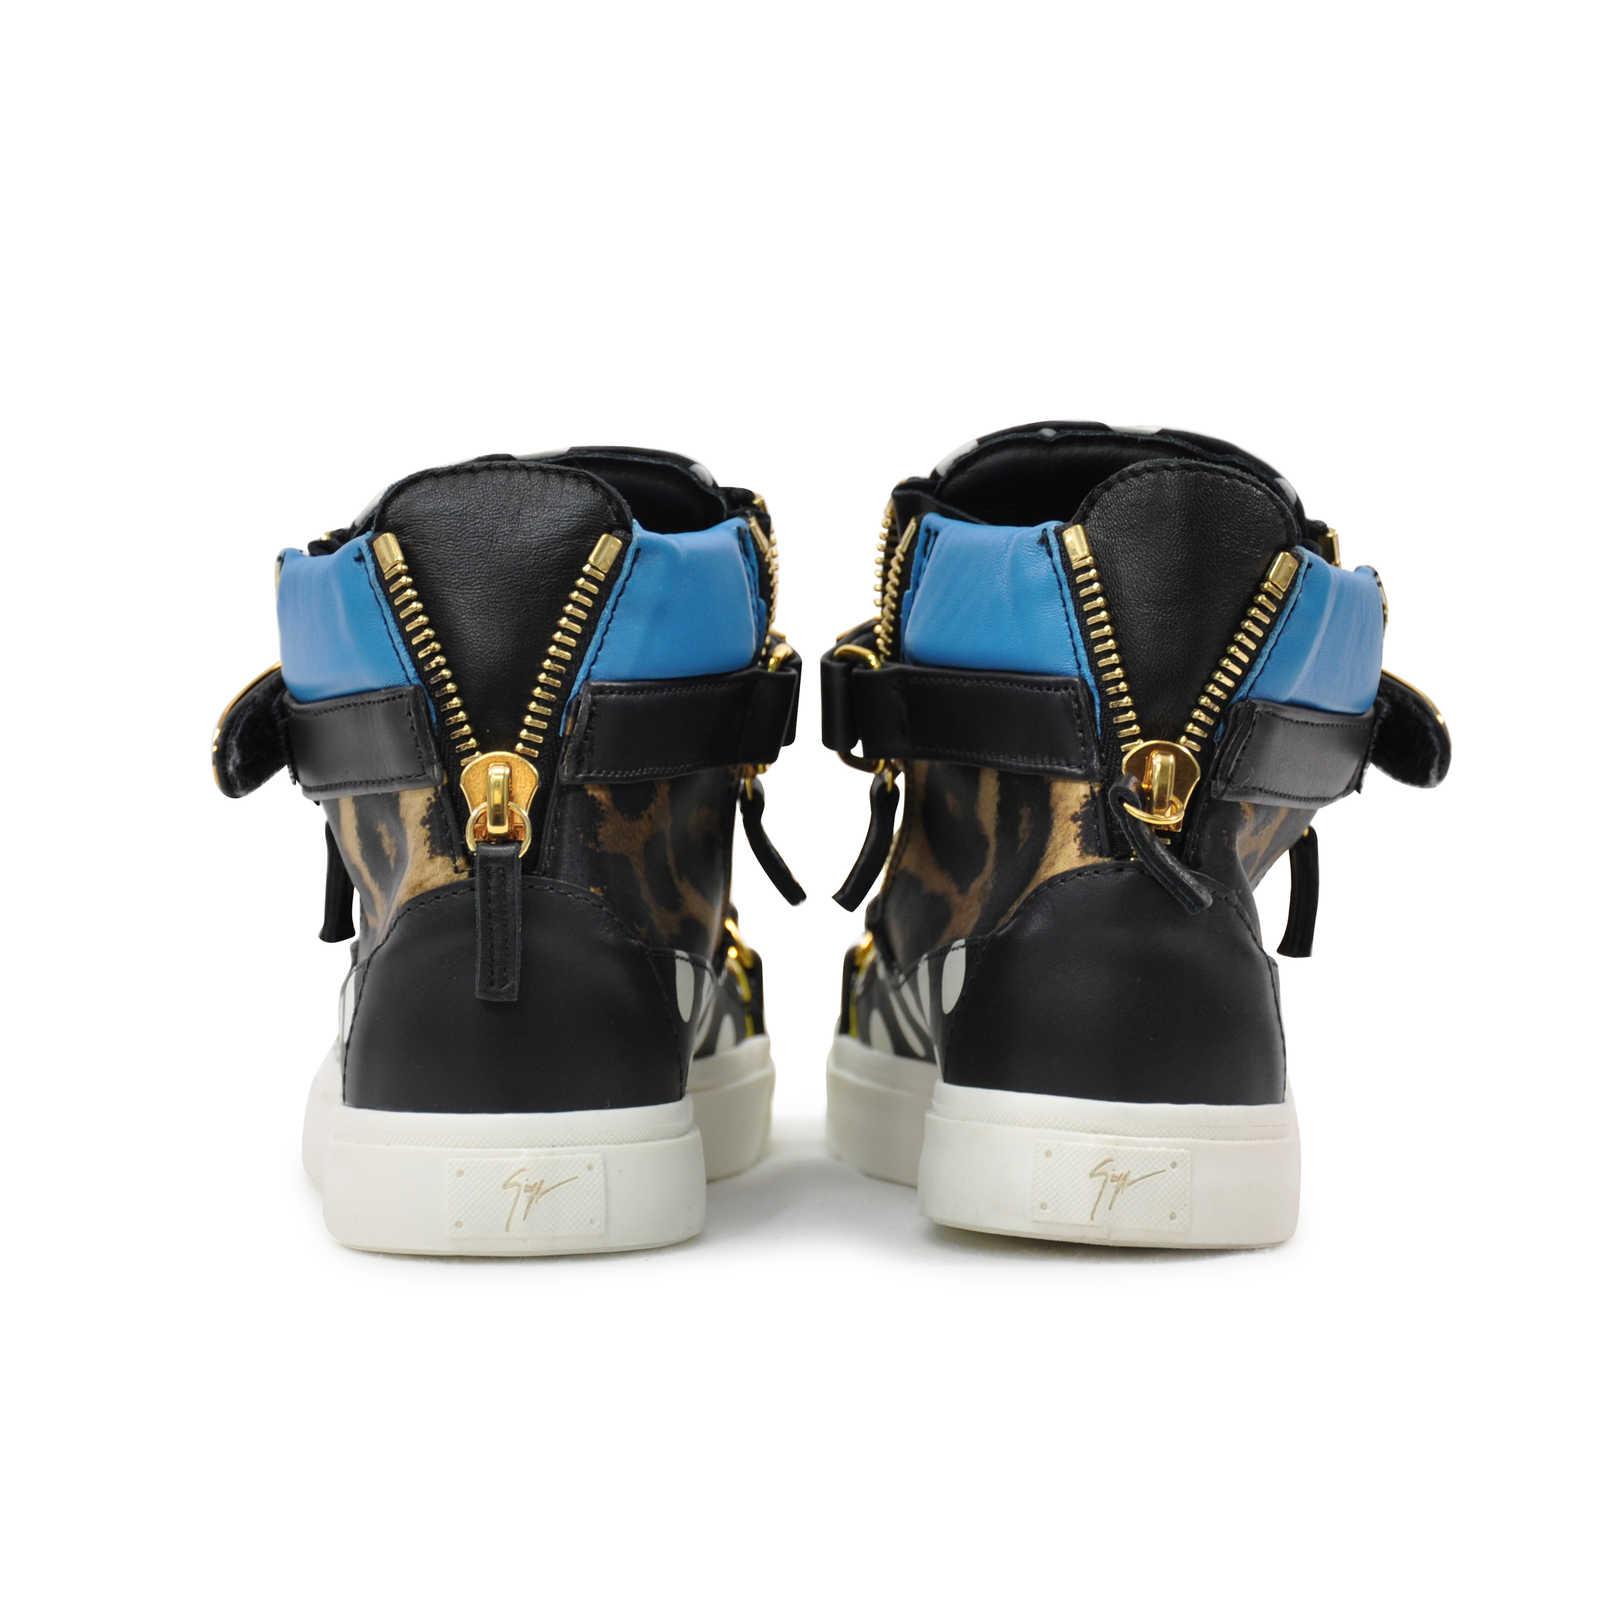 7e46b0ed3d30a ... Authentic Second Hand Giuseppe Zanotti London Polka Dot Satin Hi Top  Sneakers (PSS-200